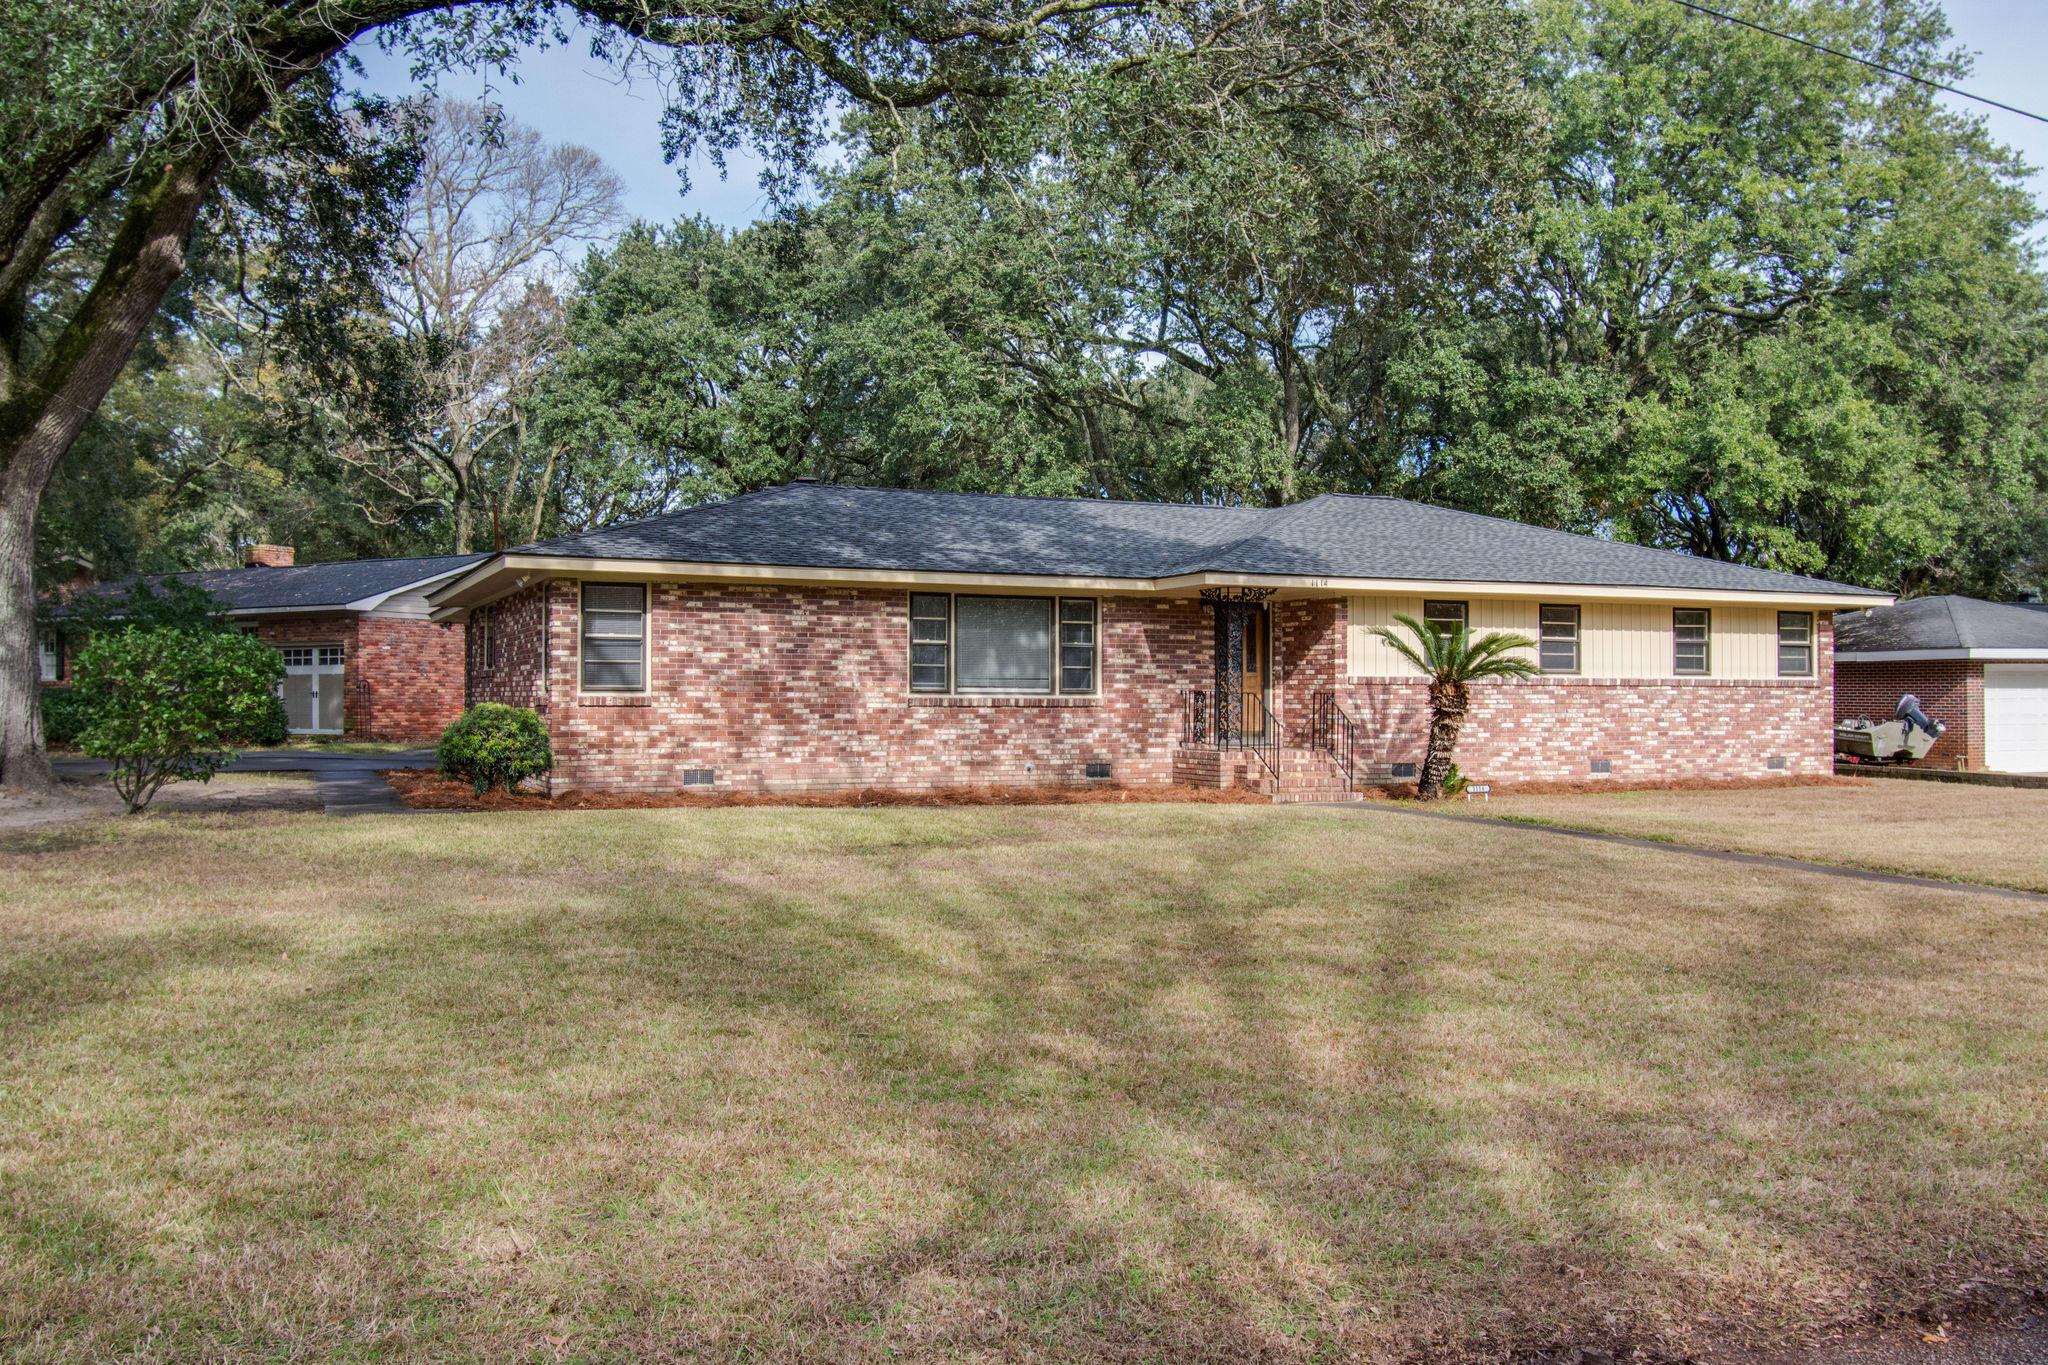 Northbridge Terrace Homes For Sale - 1114 Northbridge, Charleston, SC - 1